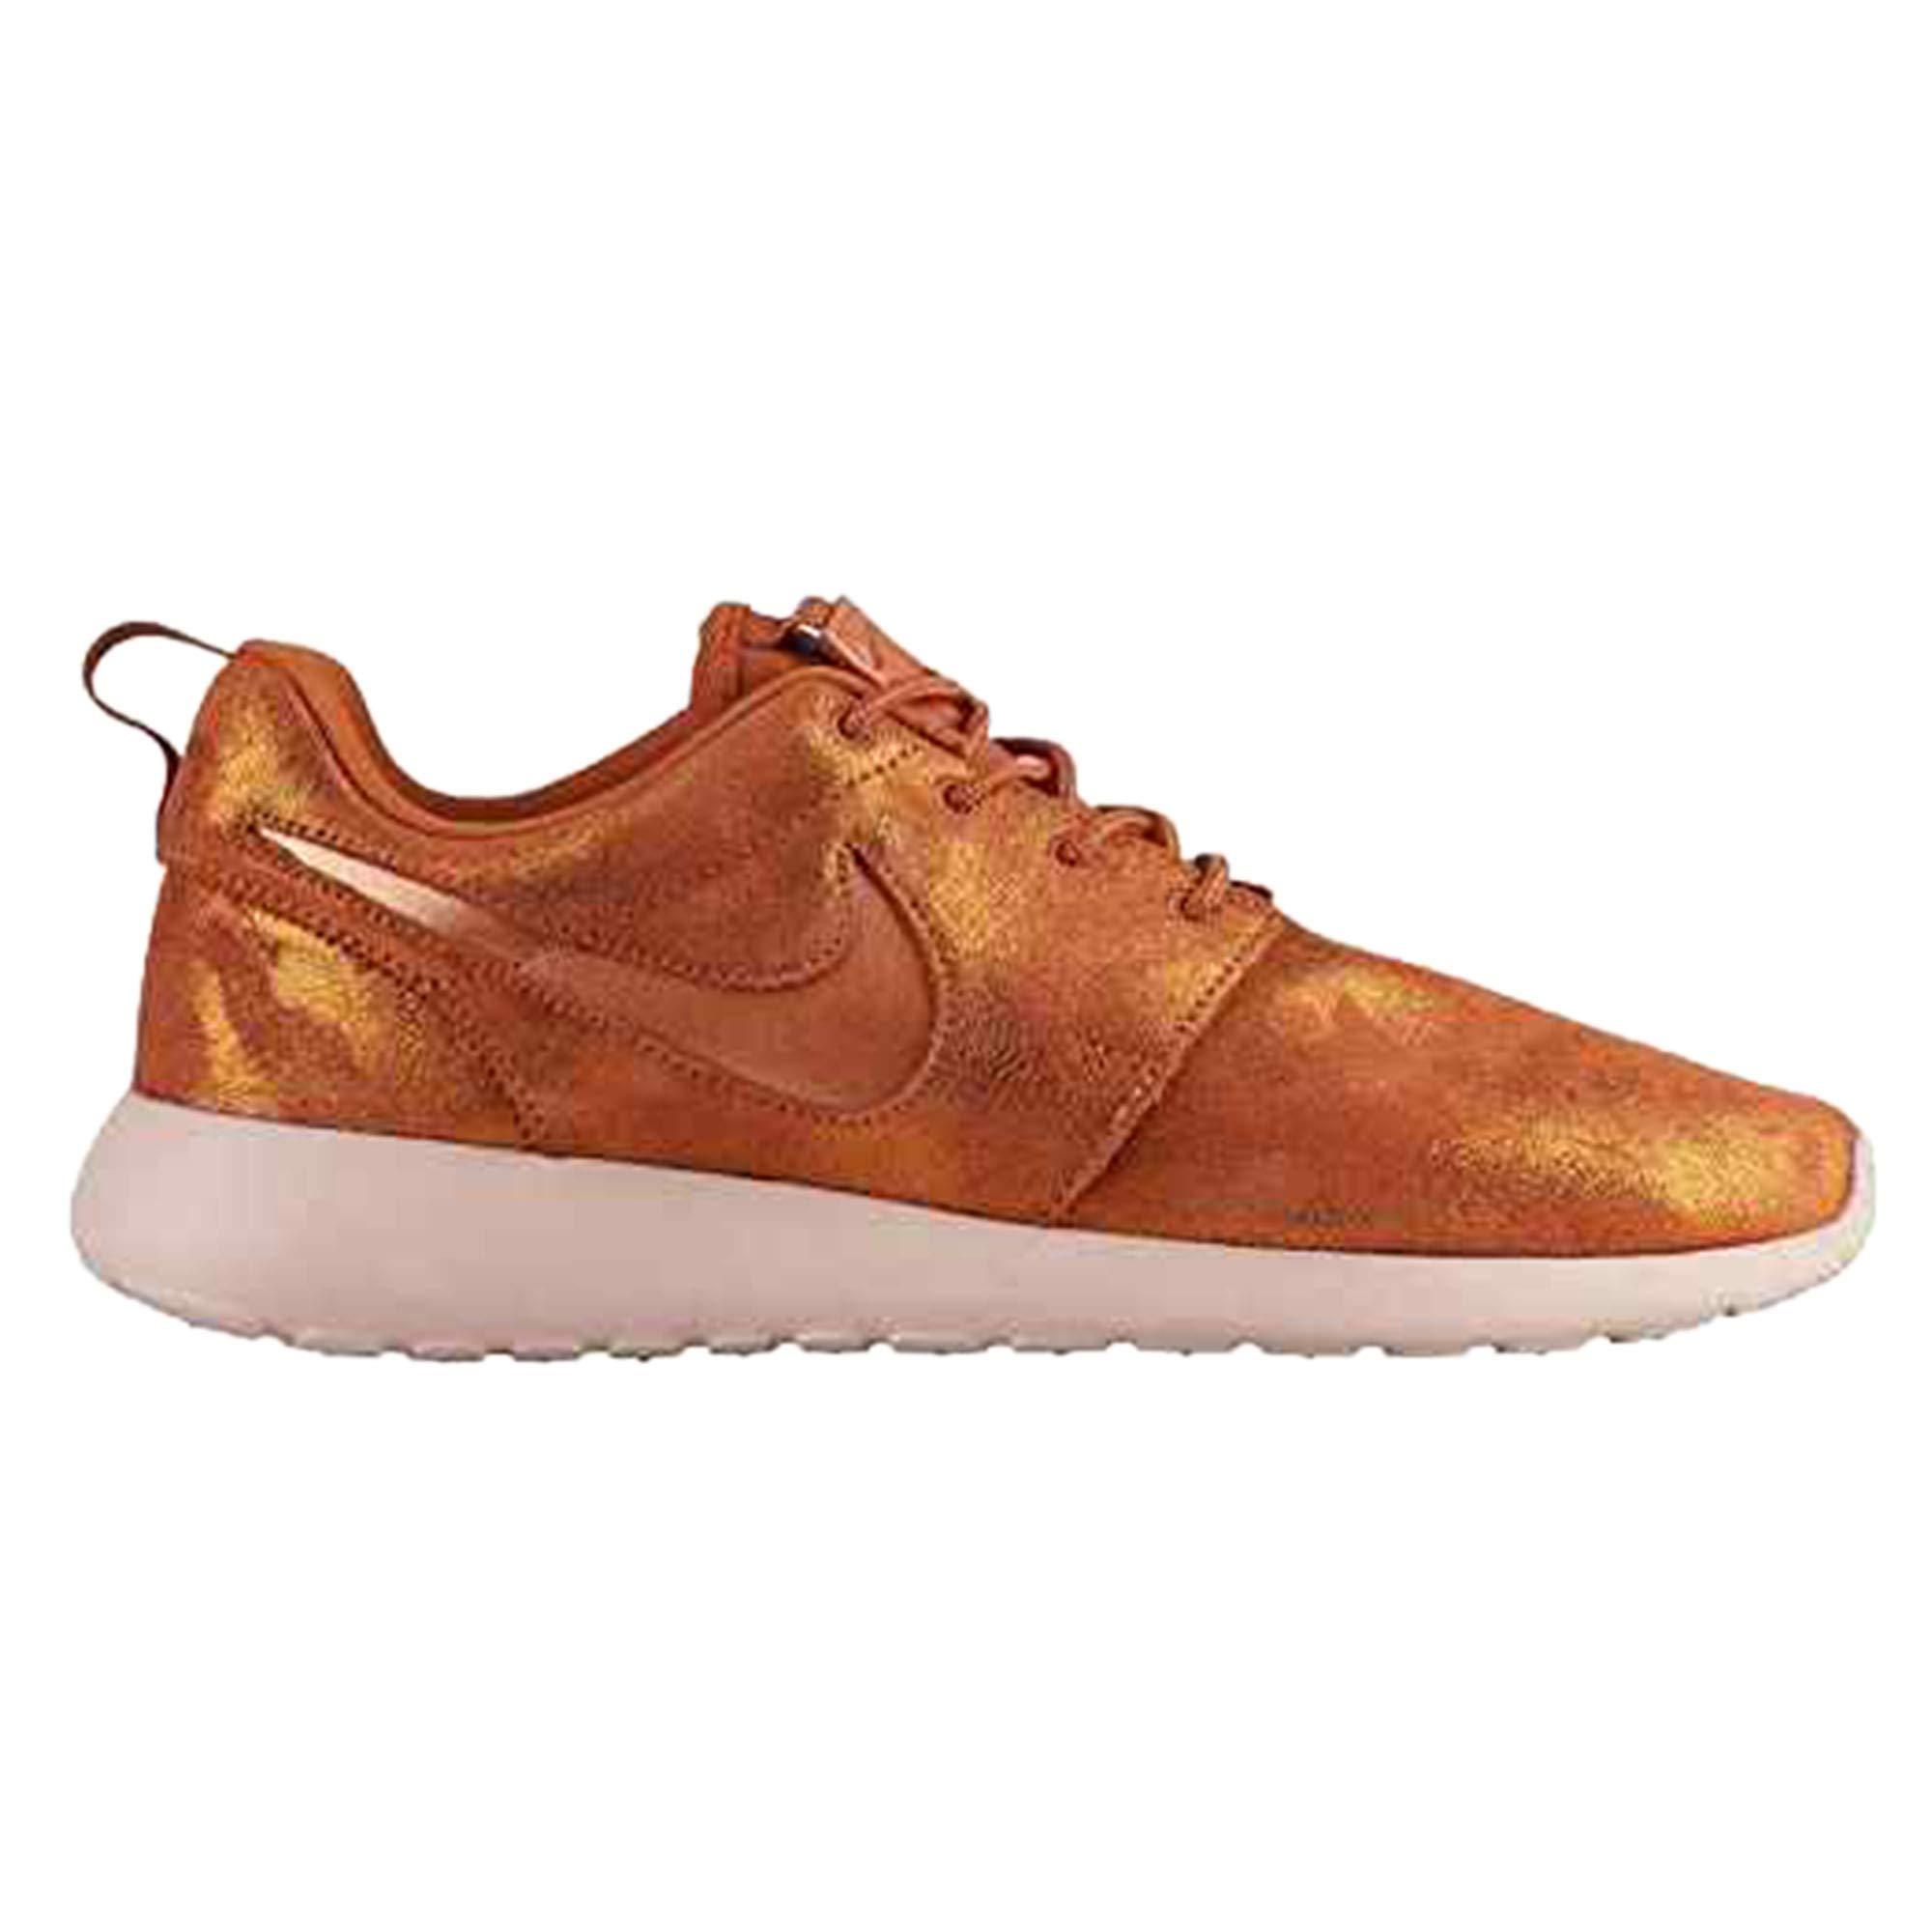 Mens Womens Nike Roshe Run Black Anthracite Running Shoes 511882 096 511882 096